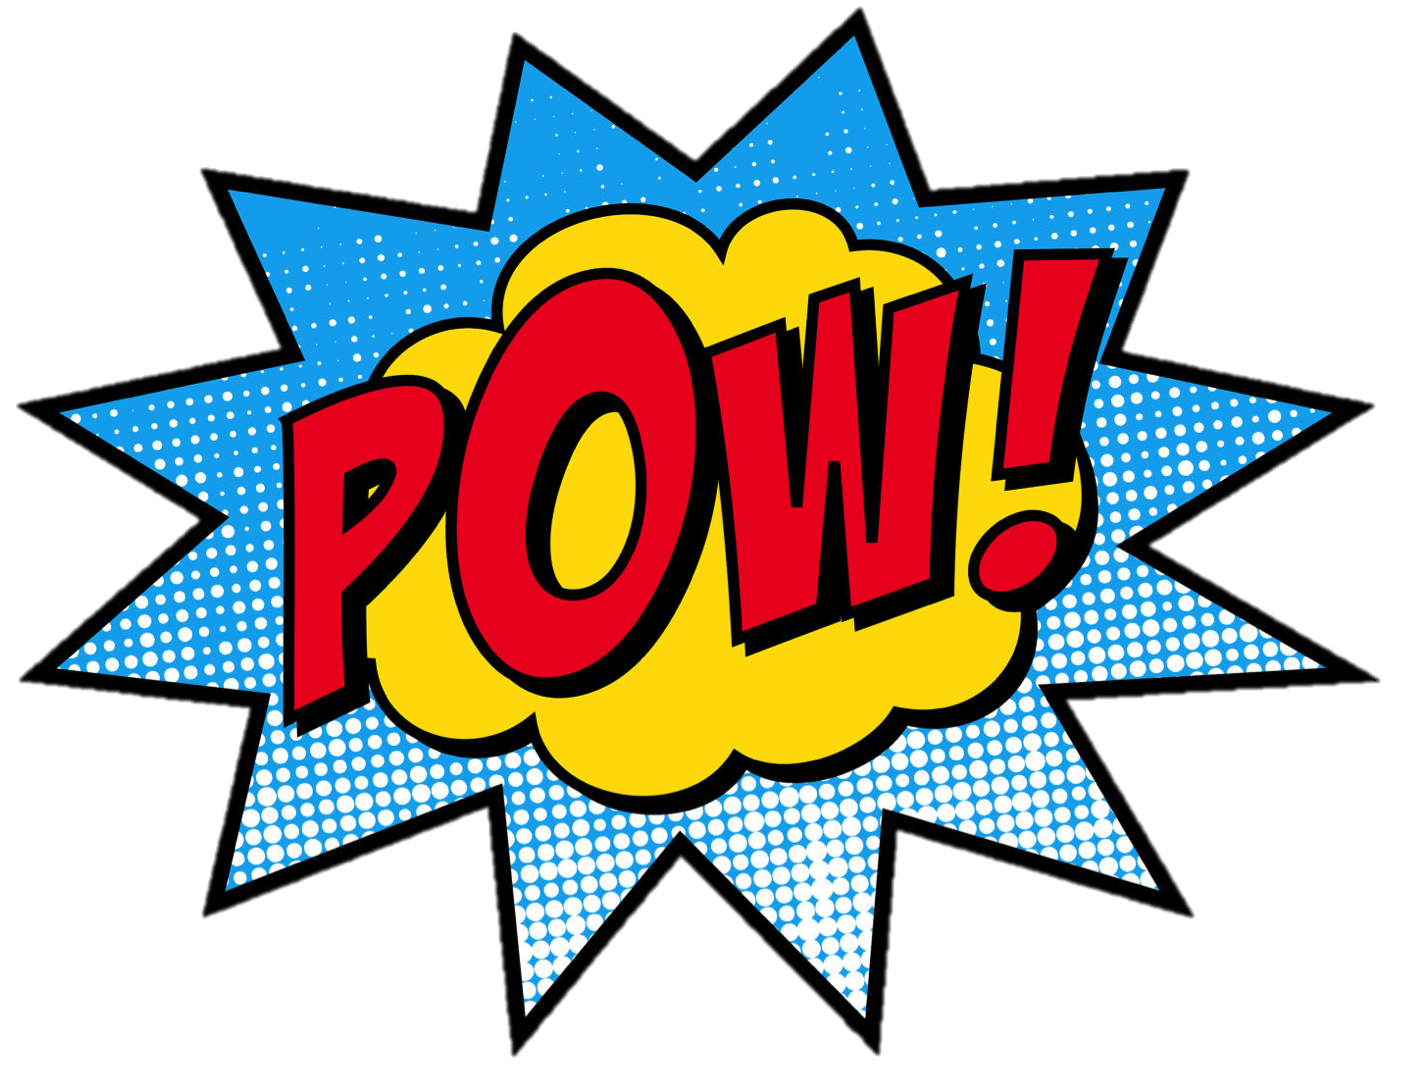 Superhero zap pow clipart library picture library Free Batman Pow Font, Download Free Clip Art, Free Clip Art ... picture library